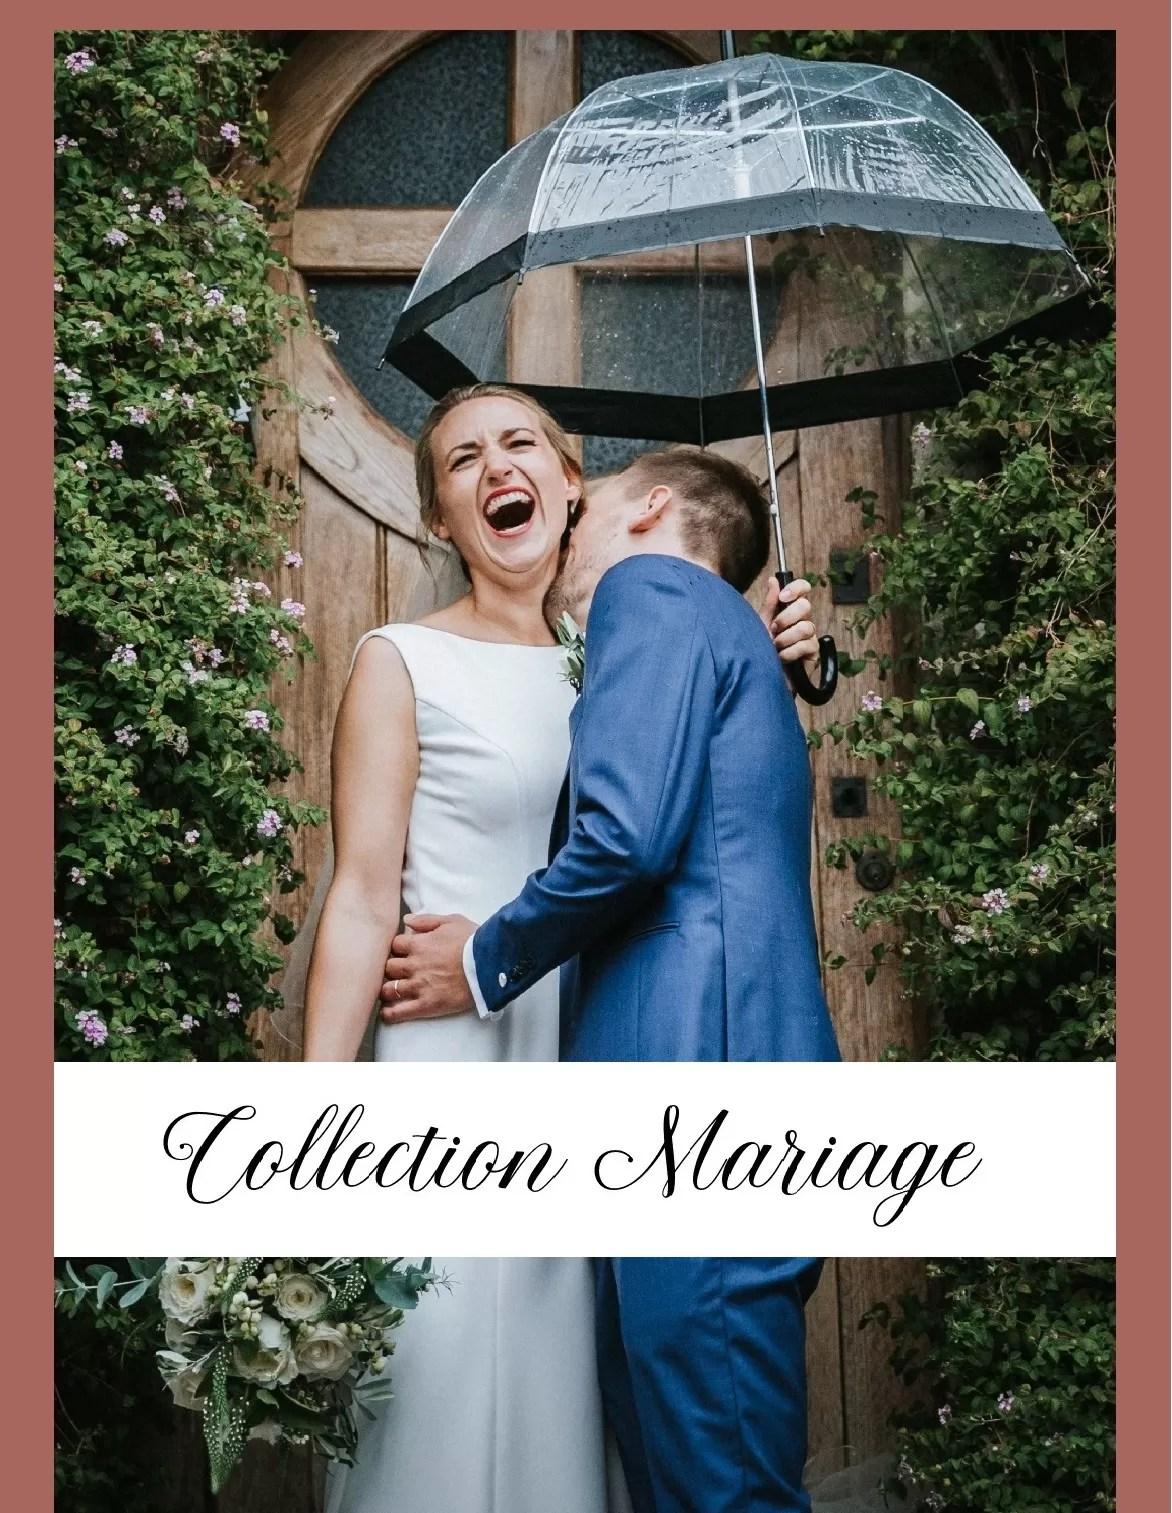 formation maquillage mariée mariage Normandie Cherbourg la Manche